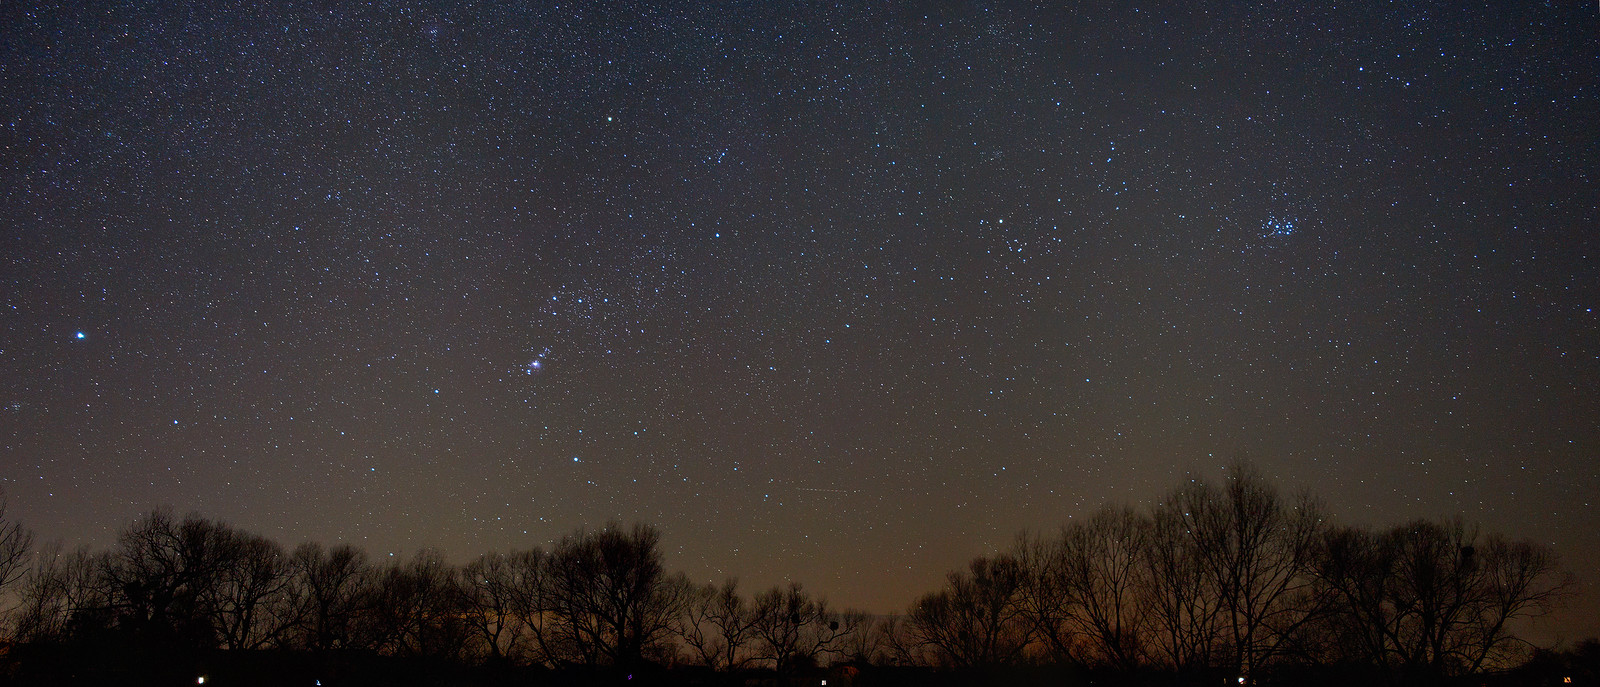 Звёздное небо Орион и Плеяды mrradetel